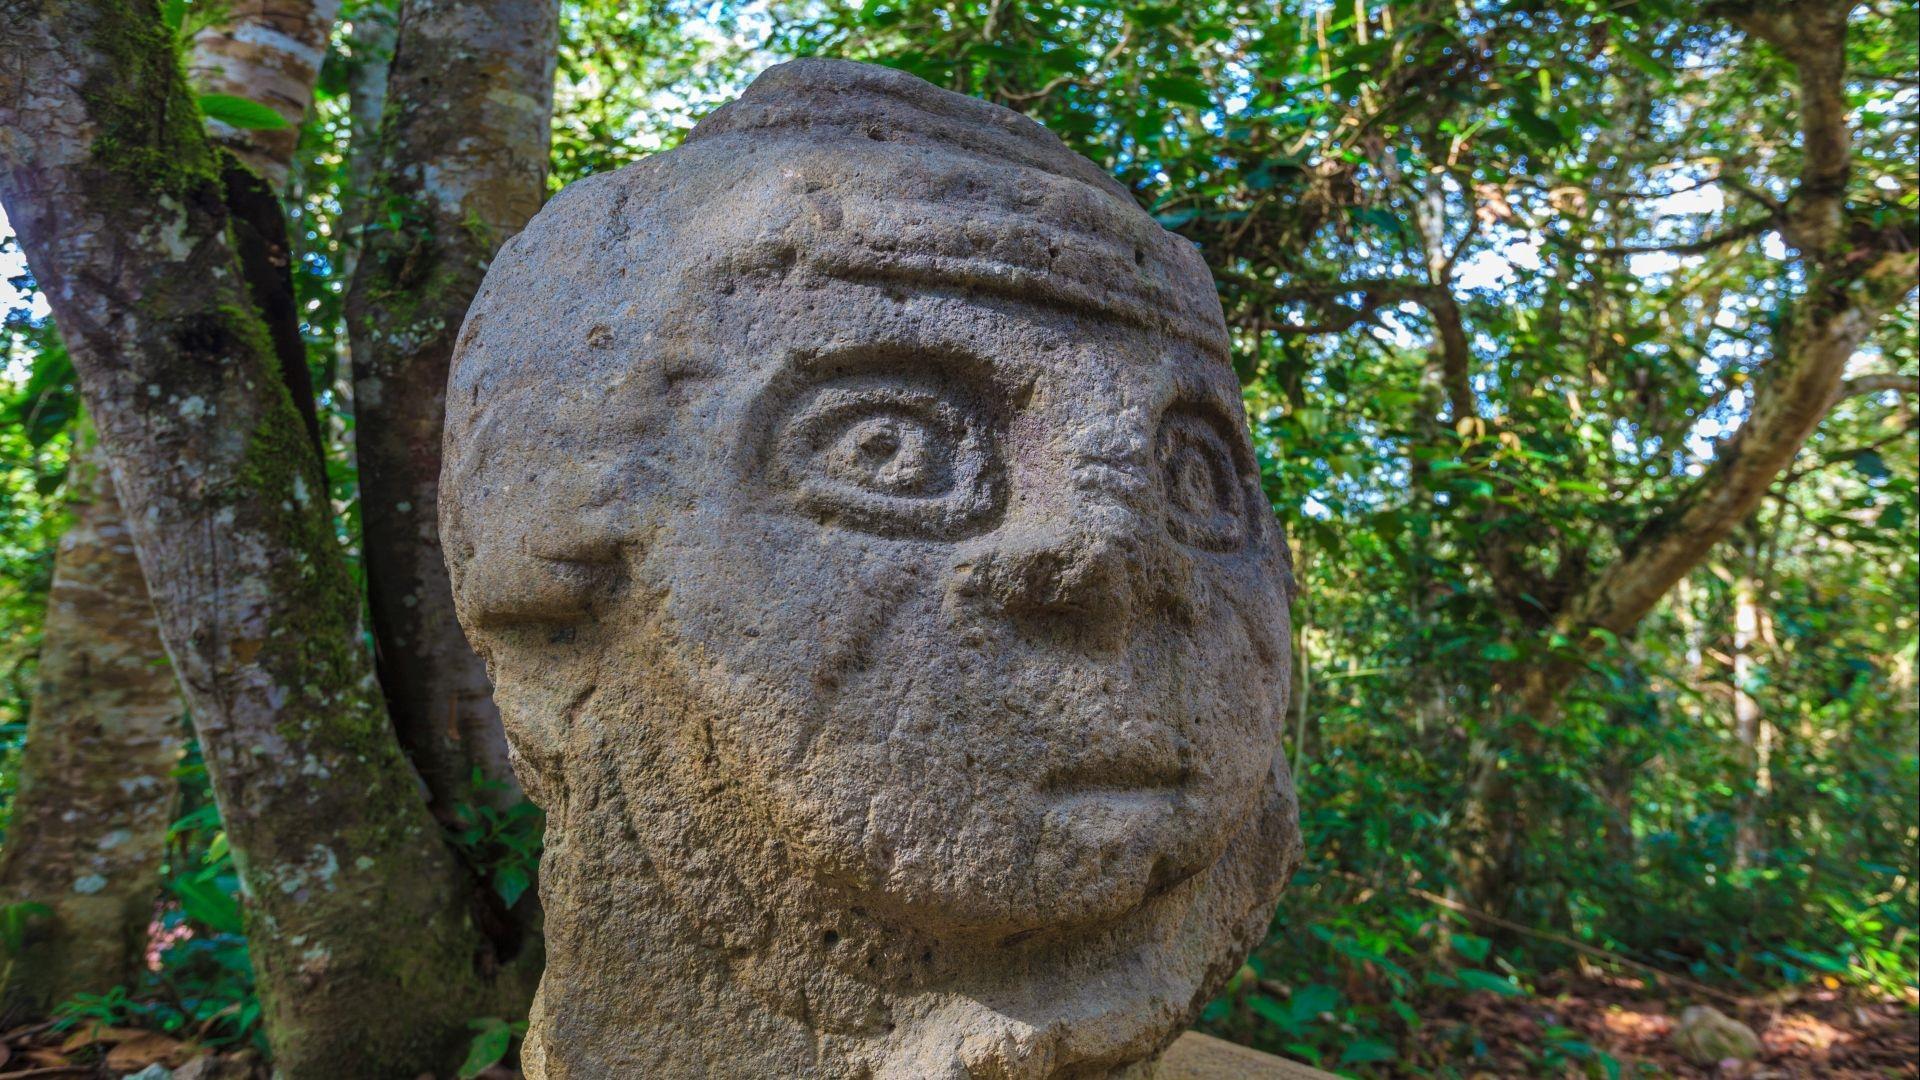 Kolumbien / Bogota, San Agustin, Tierradentro, Popayan, Cartagena: 10 Tage Erlebnisreise - Das präkolumbianisches Kulturerbe